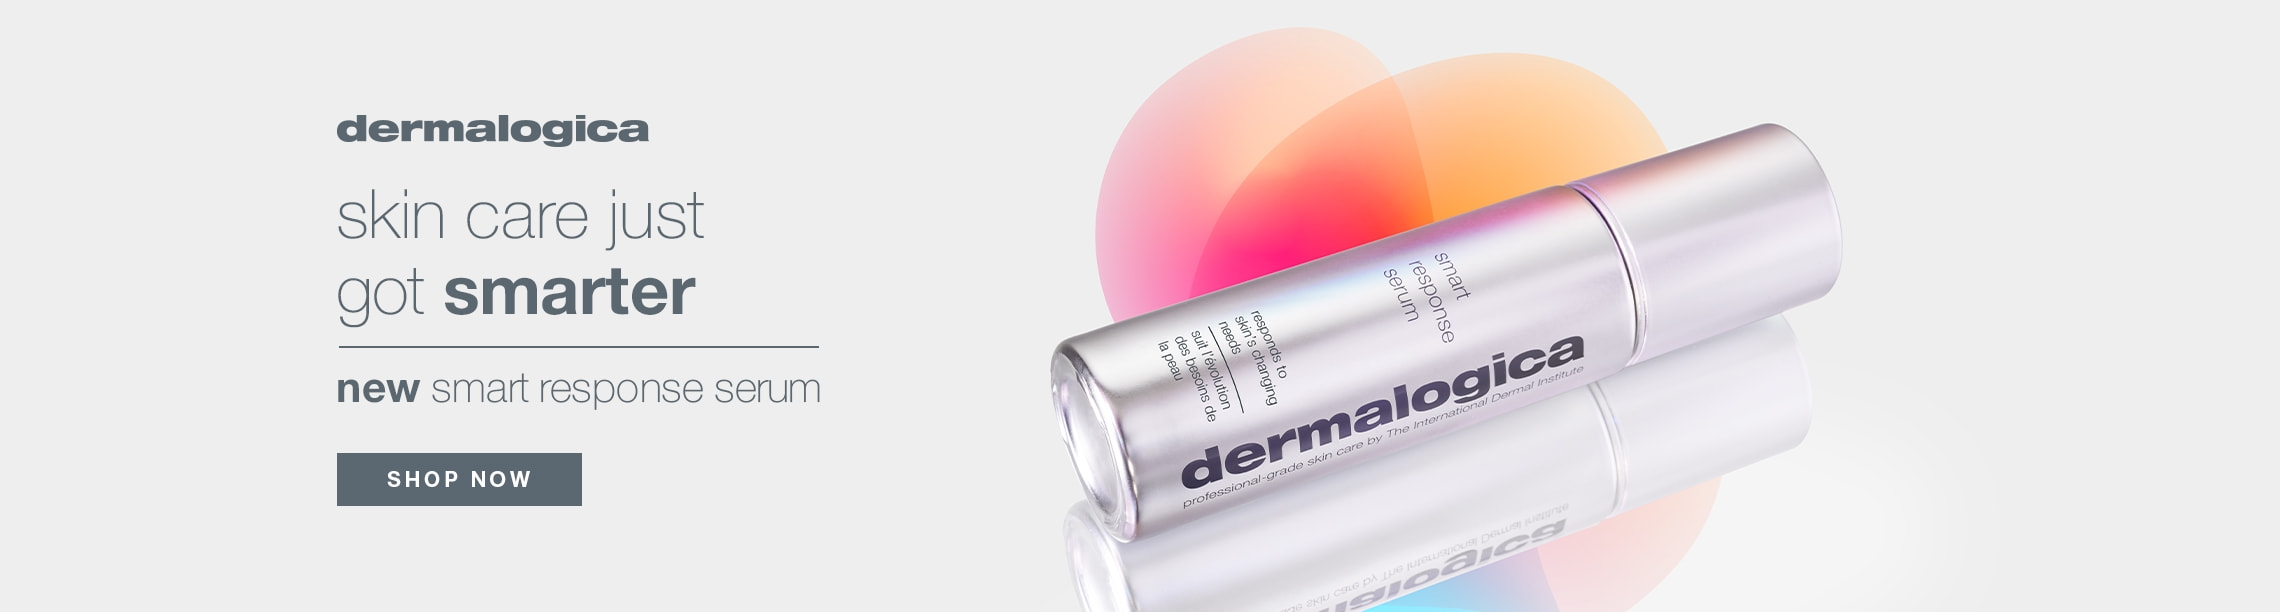 New dermalogica smart response serum